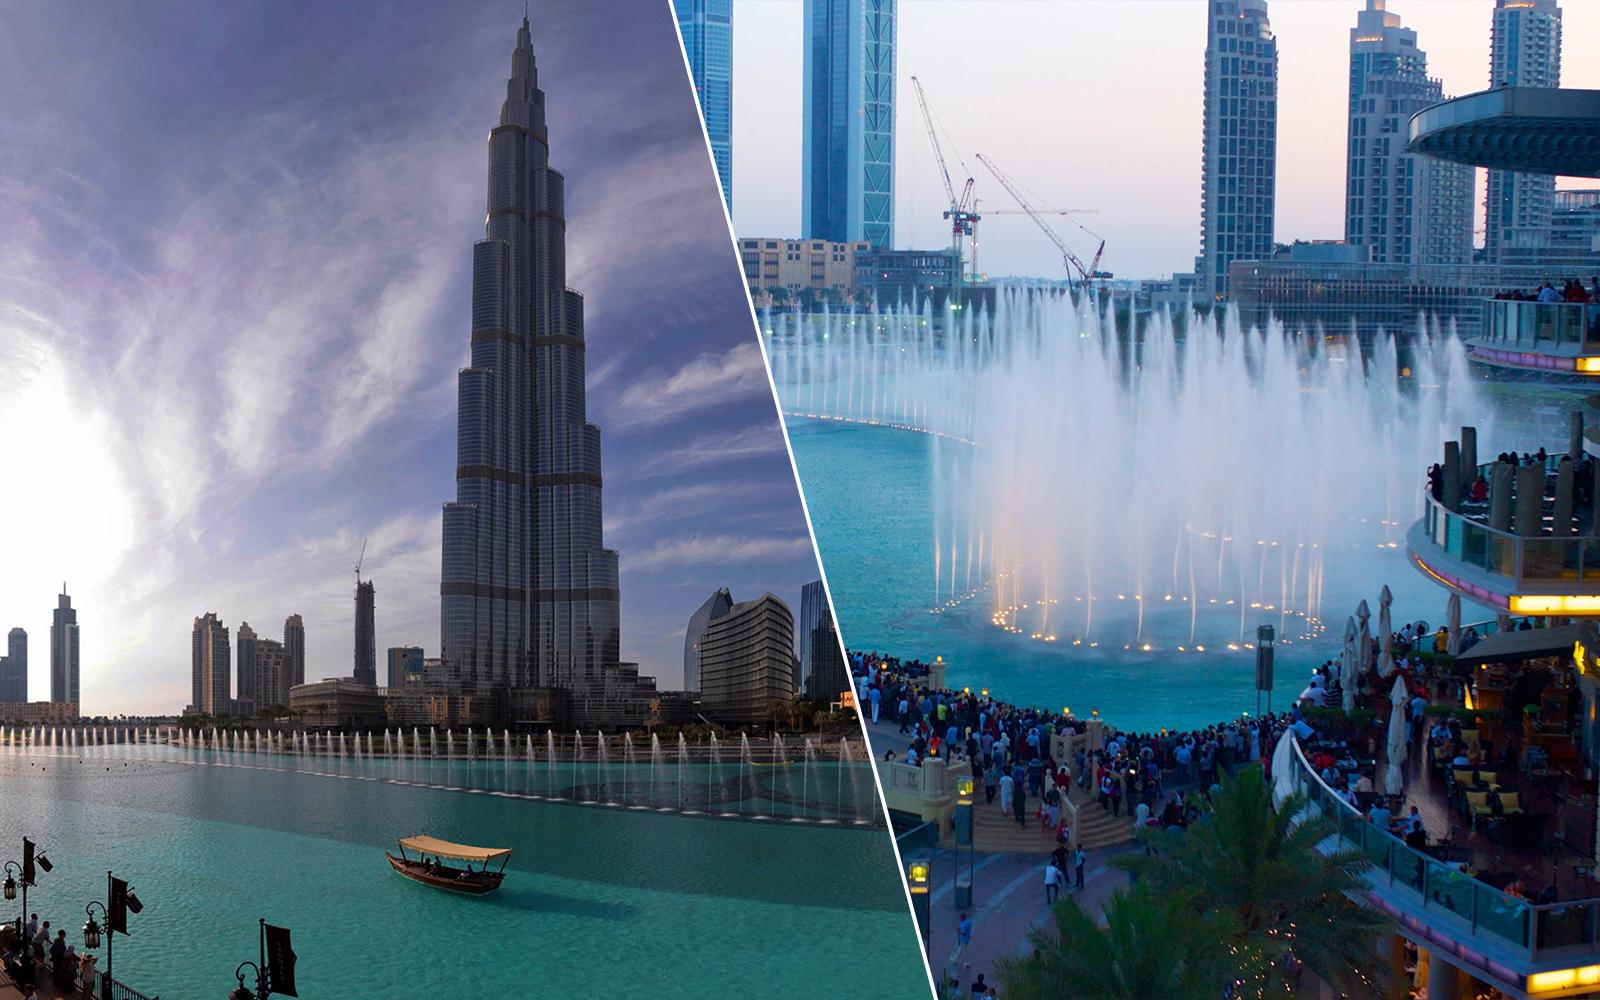 Burj Khalifa And Dubai Aquarium Ticket Combo Discounted